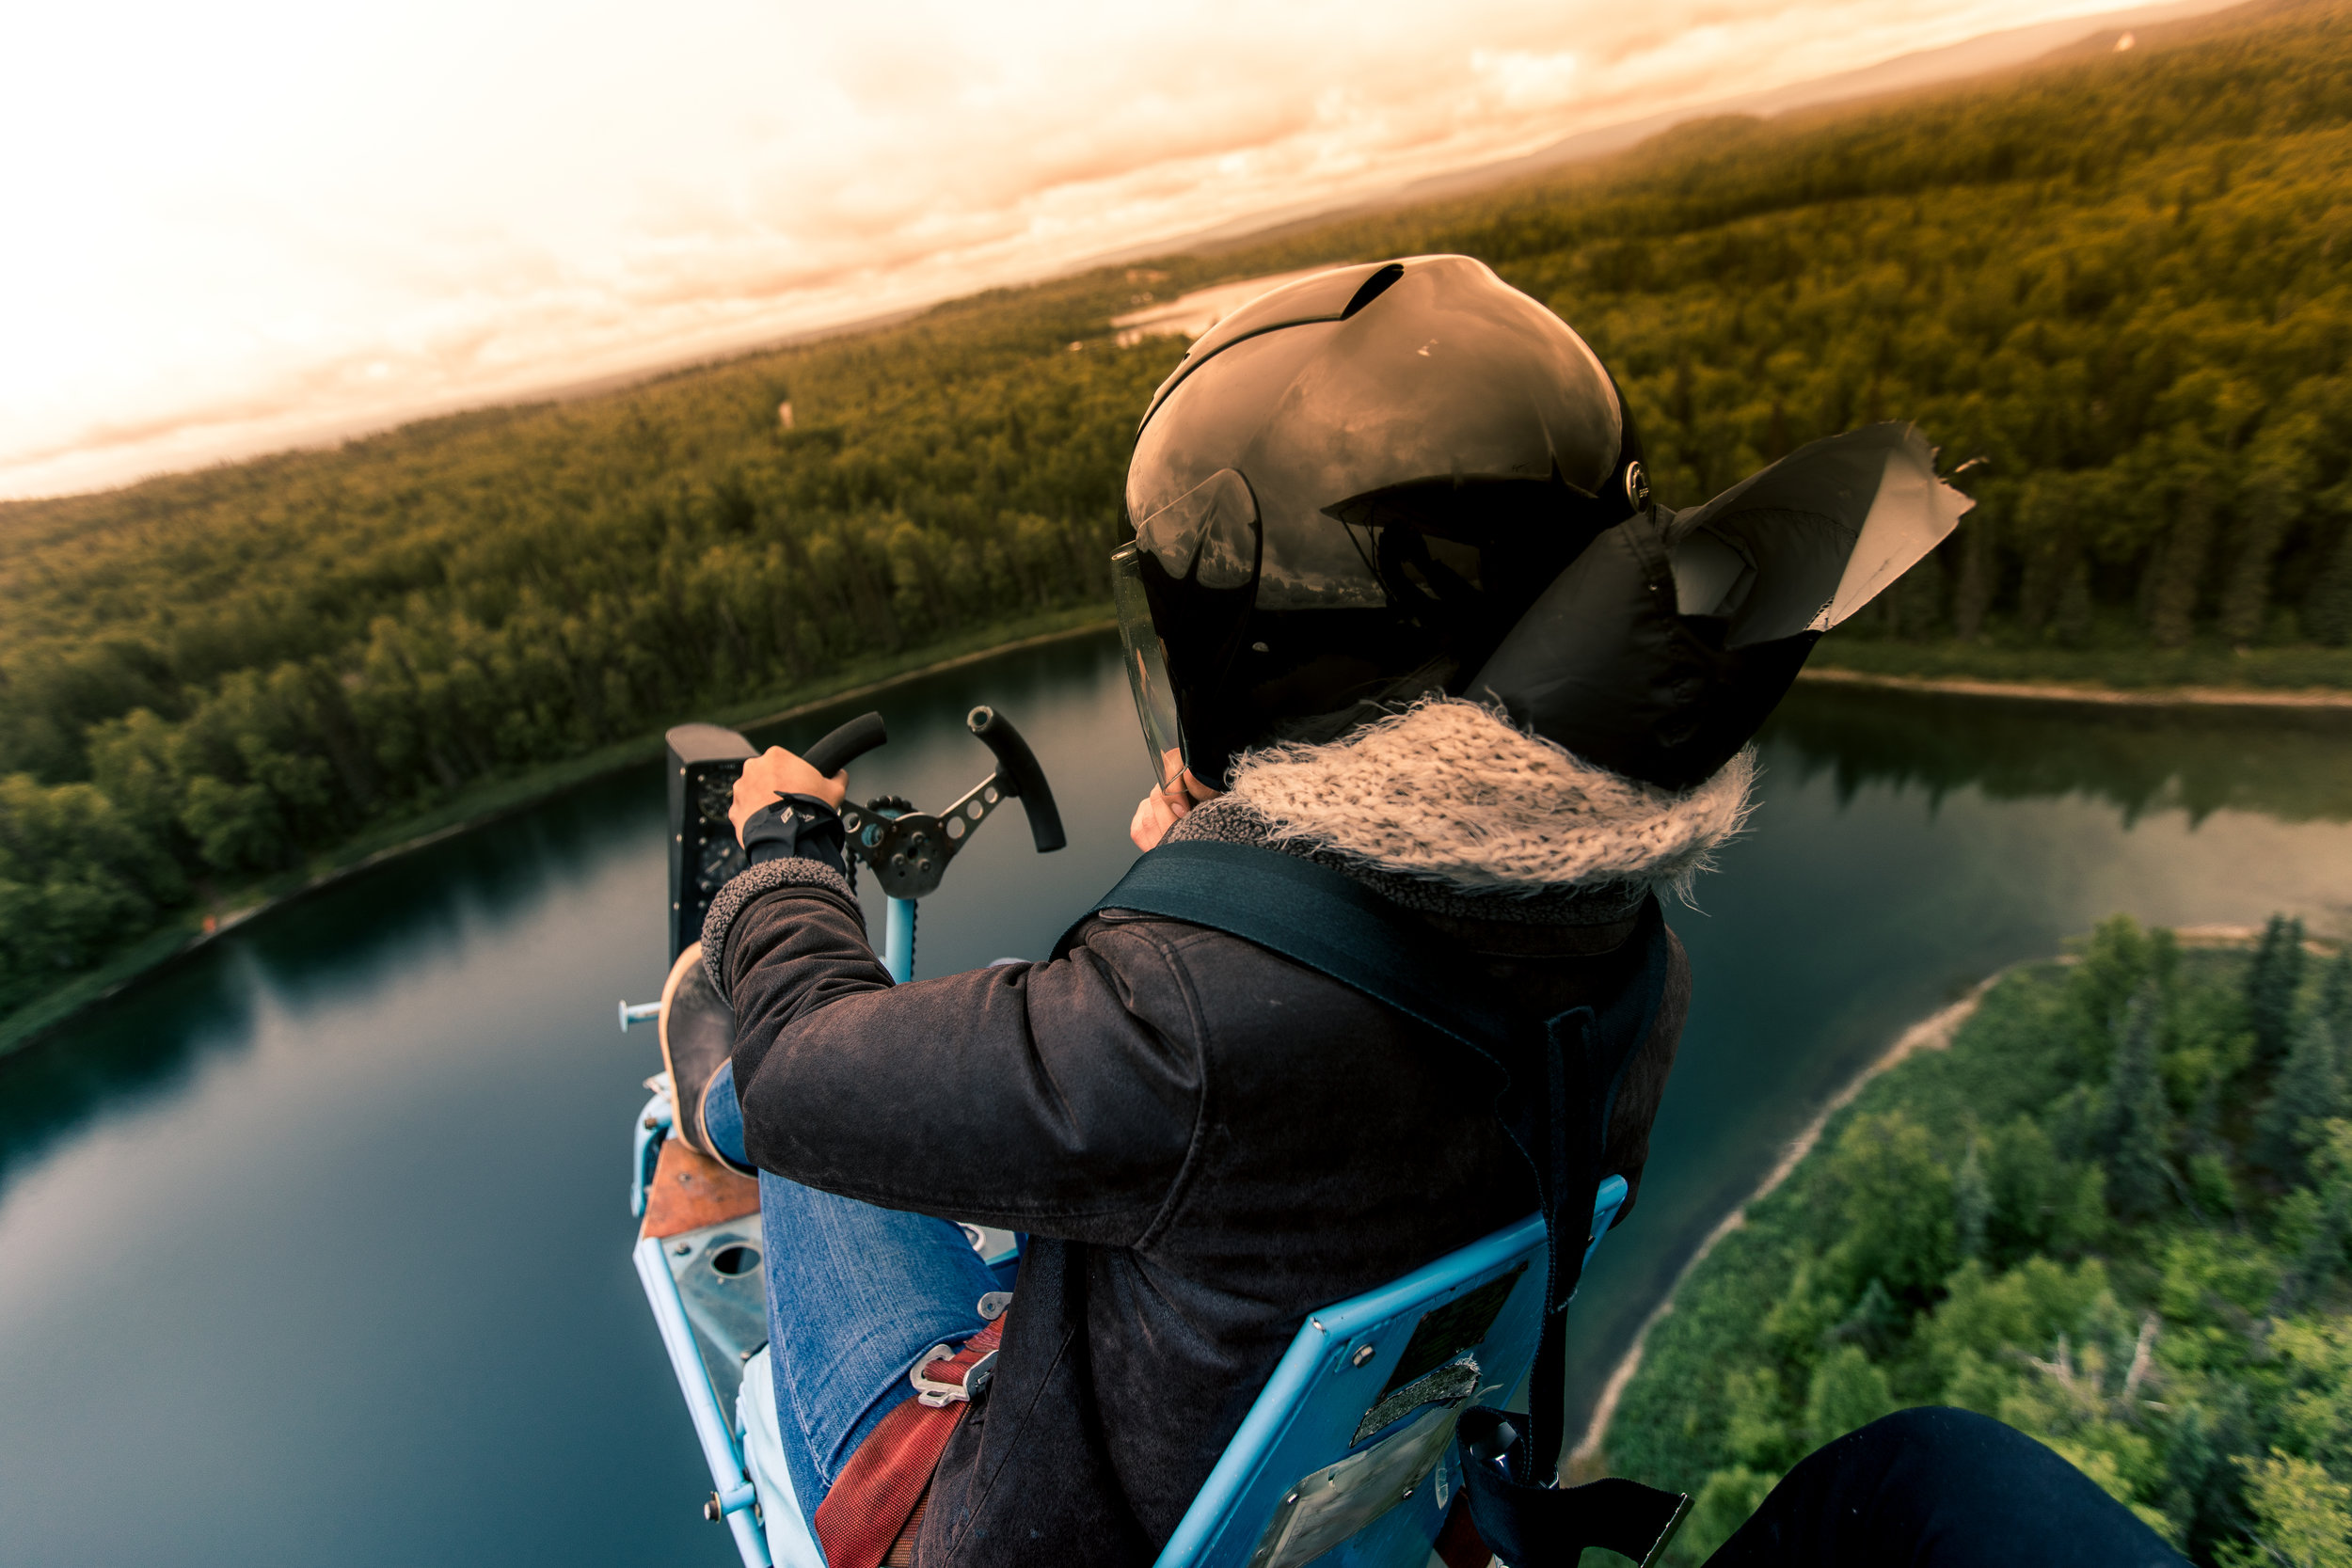 Brooke Roman, Alaskan Bush Pilot on the Breezy, an open cockpit home-made plane.